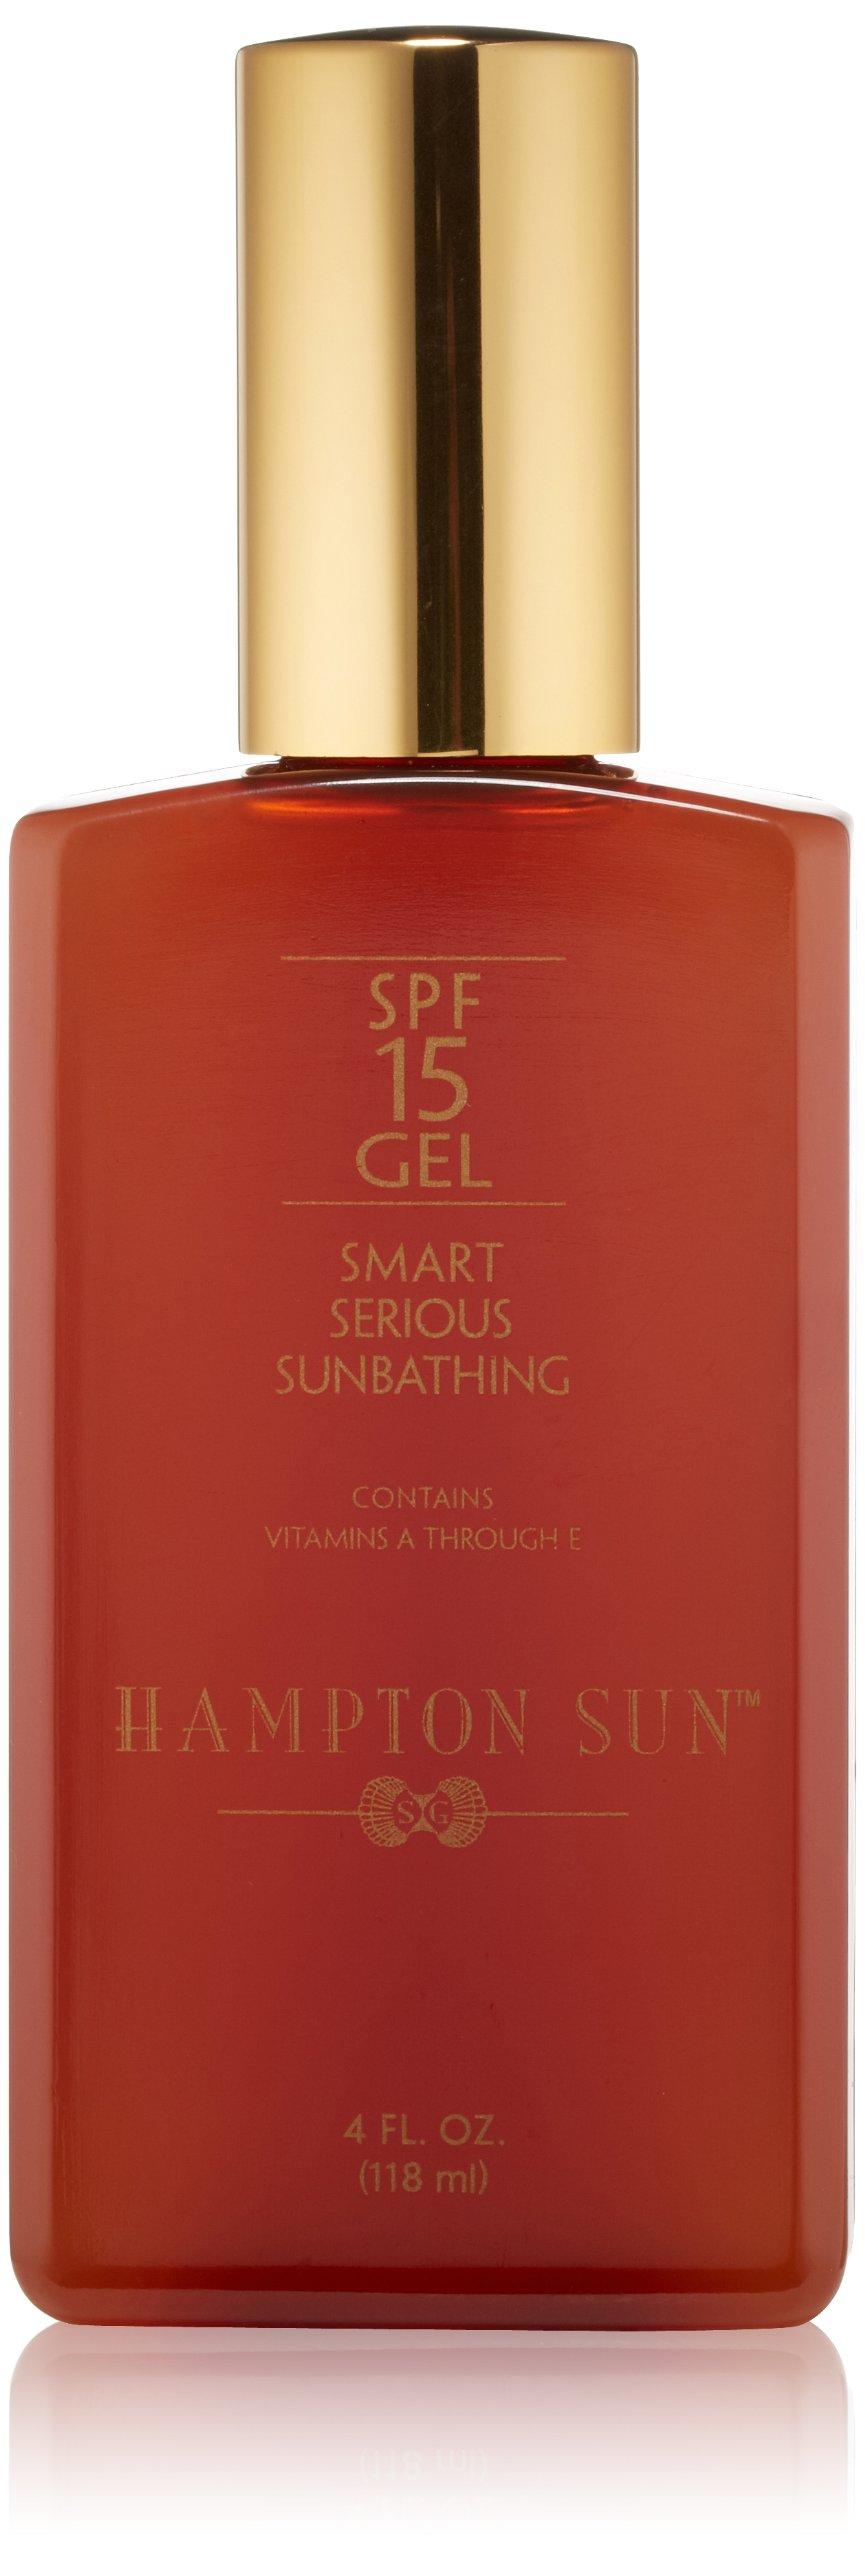 Hampton Sun SPF 15 Gel, 4 fl. oz.